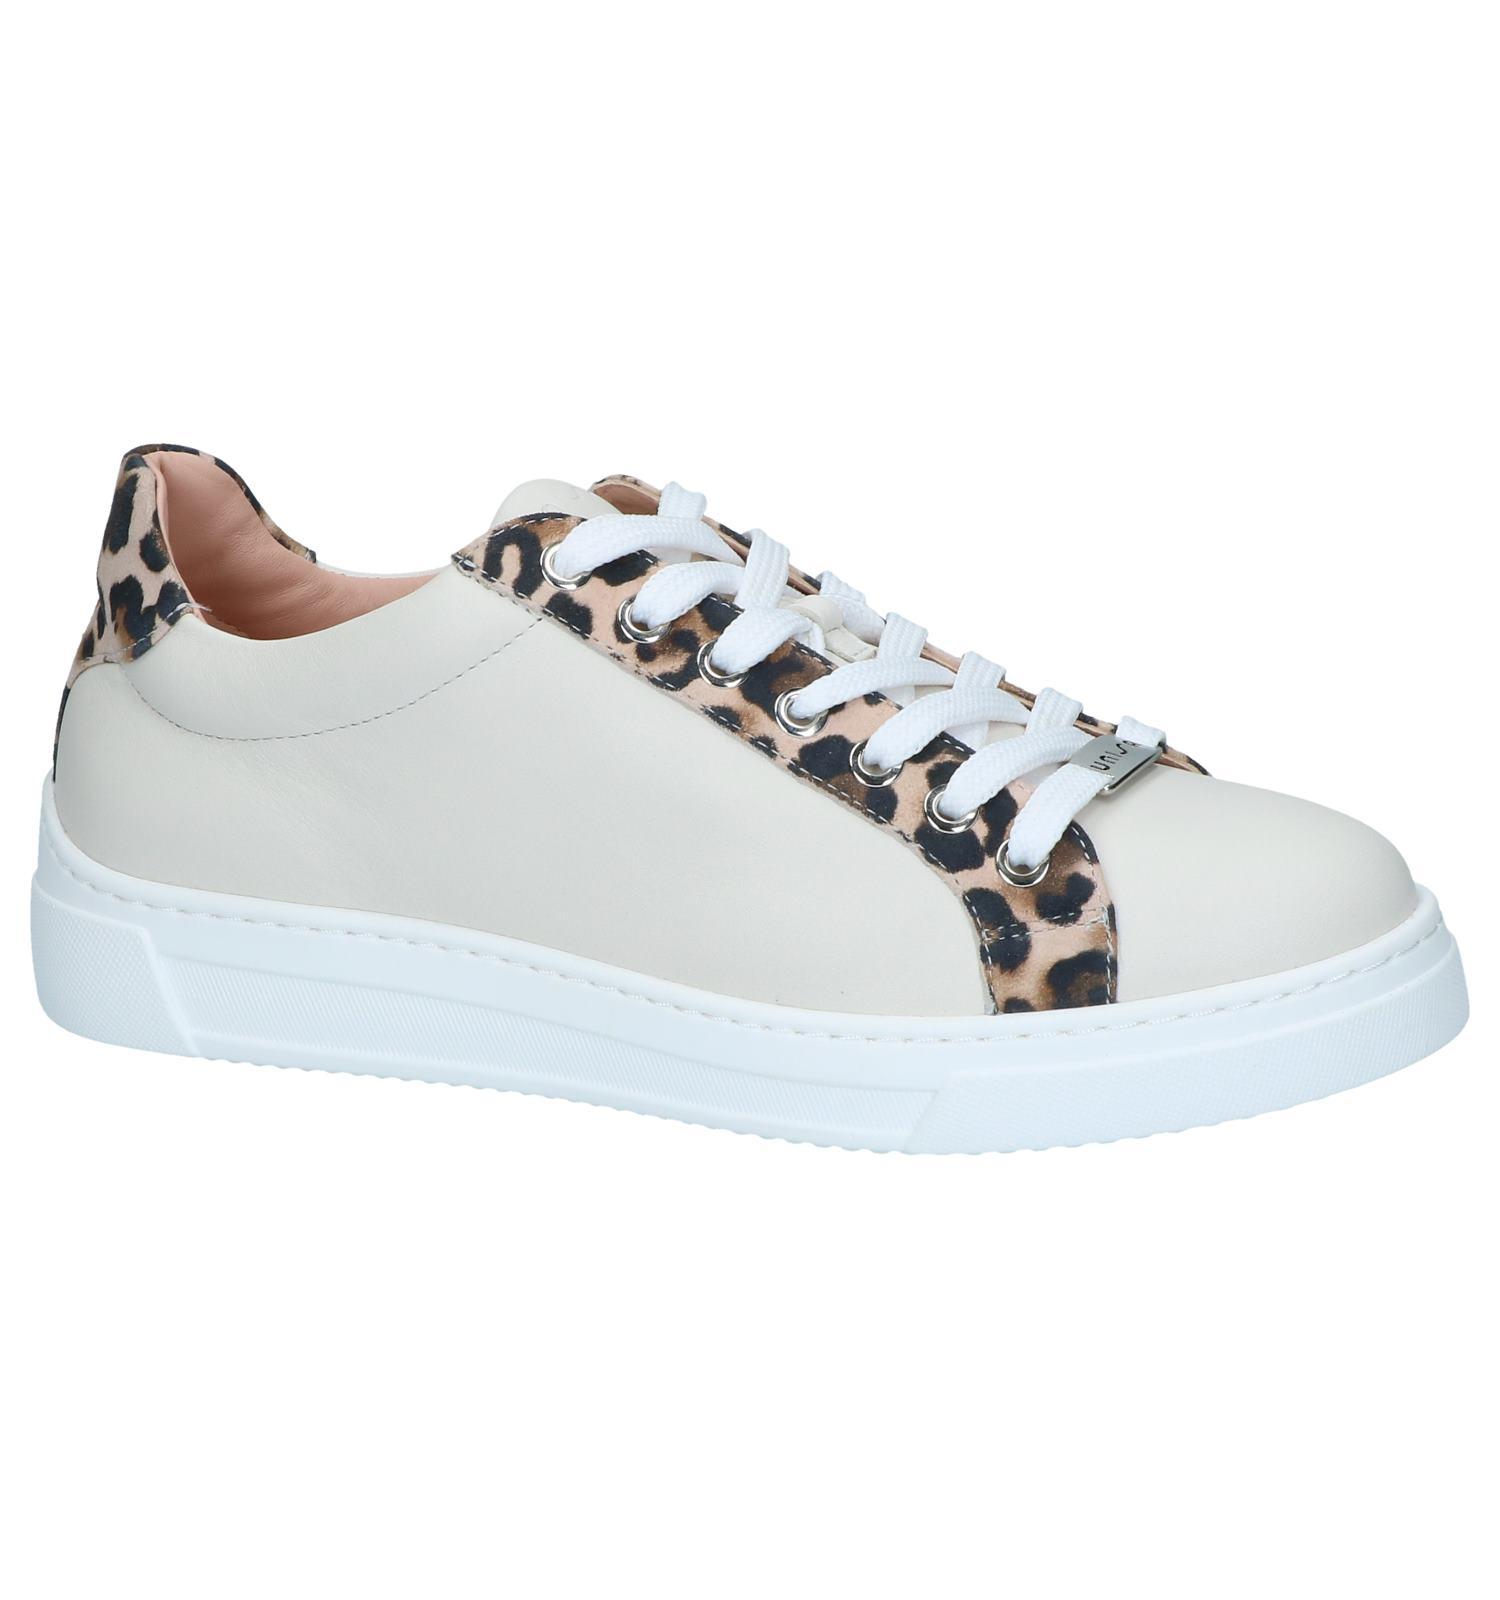 Witte Lage Sneakers Unisa Franci | SCHOENENTORFS.NL | Gratis verzend en retour